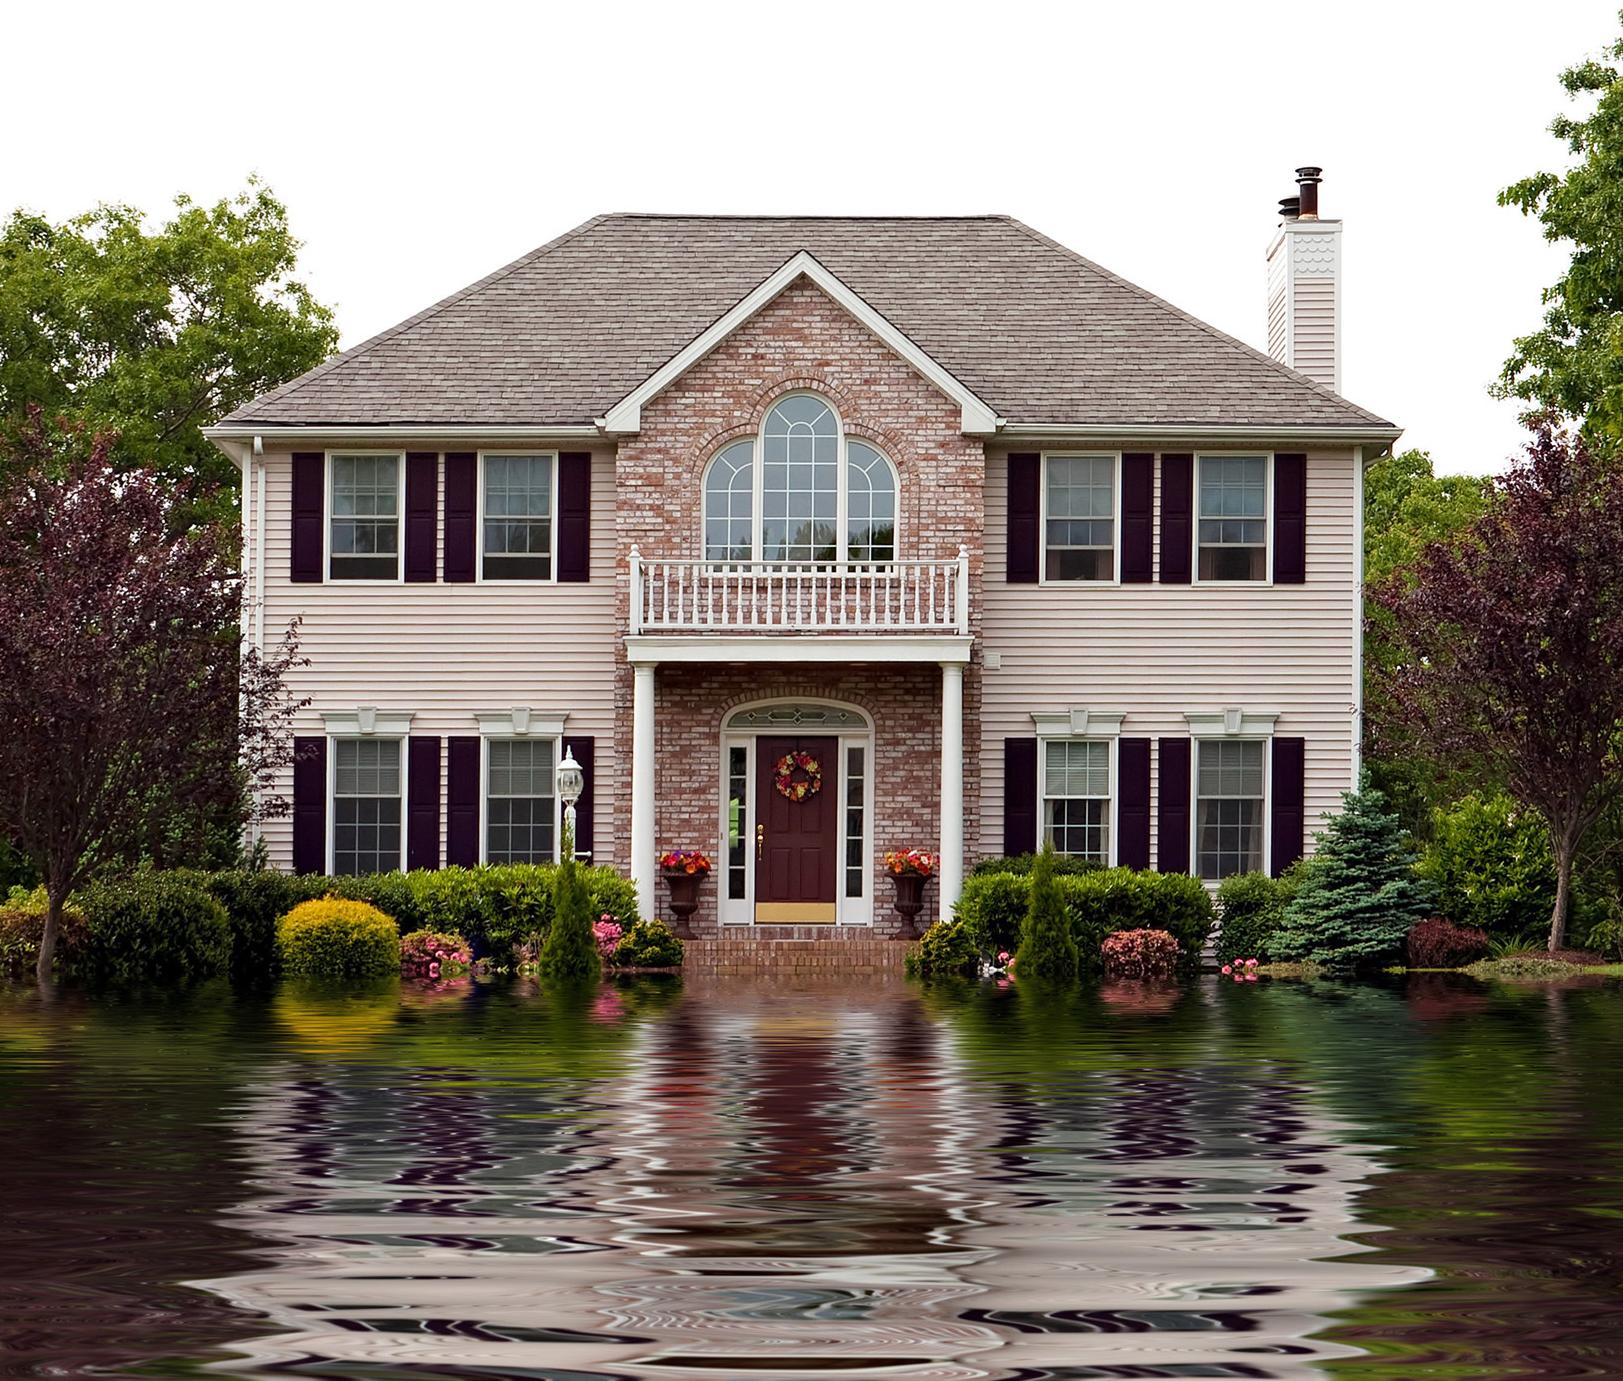 Flood Insurance Quotes Flood Insurance  Harold J Fox Insurance Agency  Kalamazoo